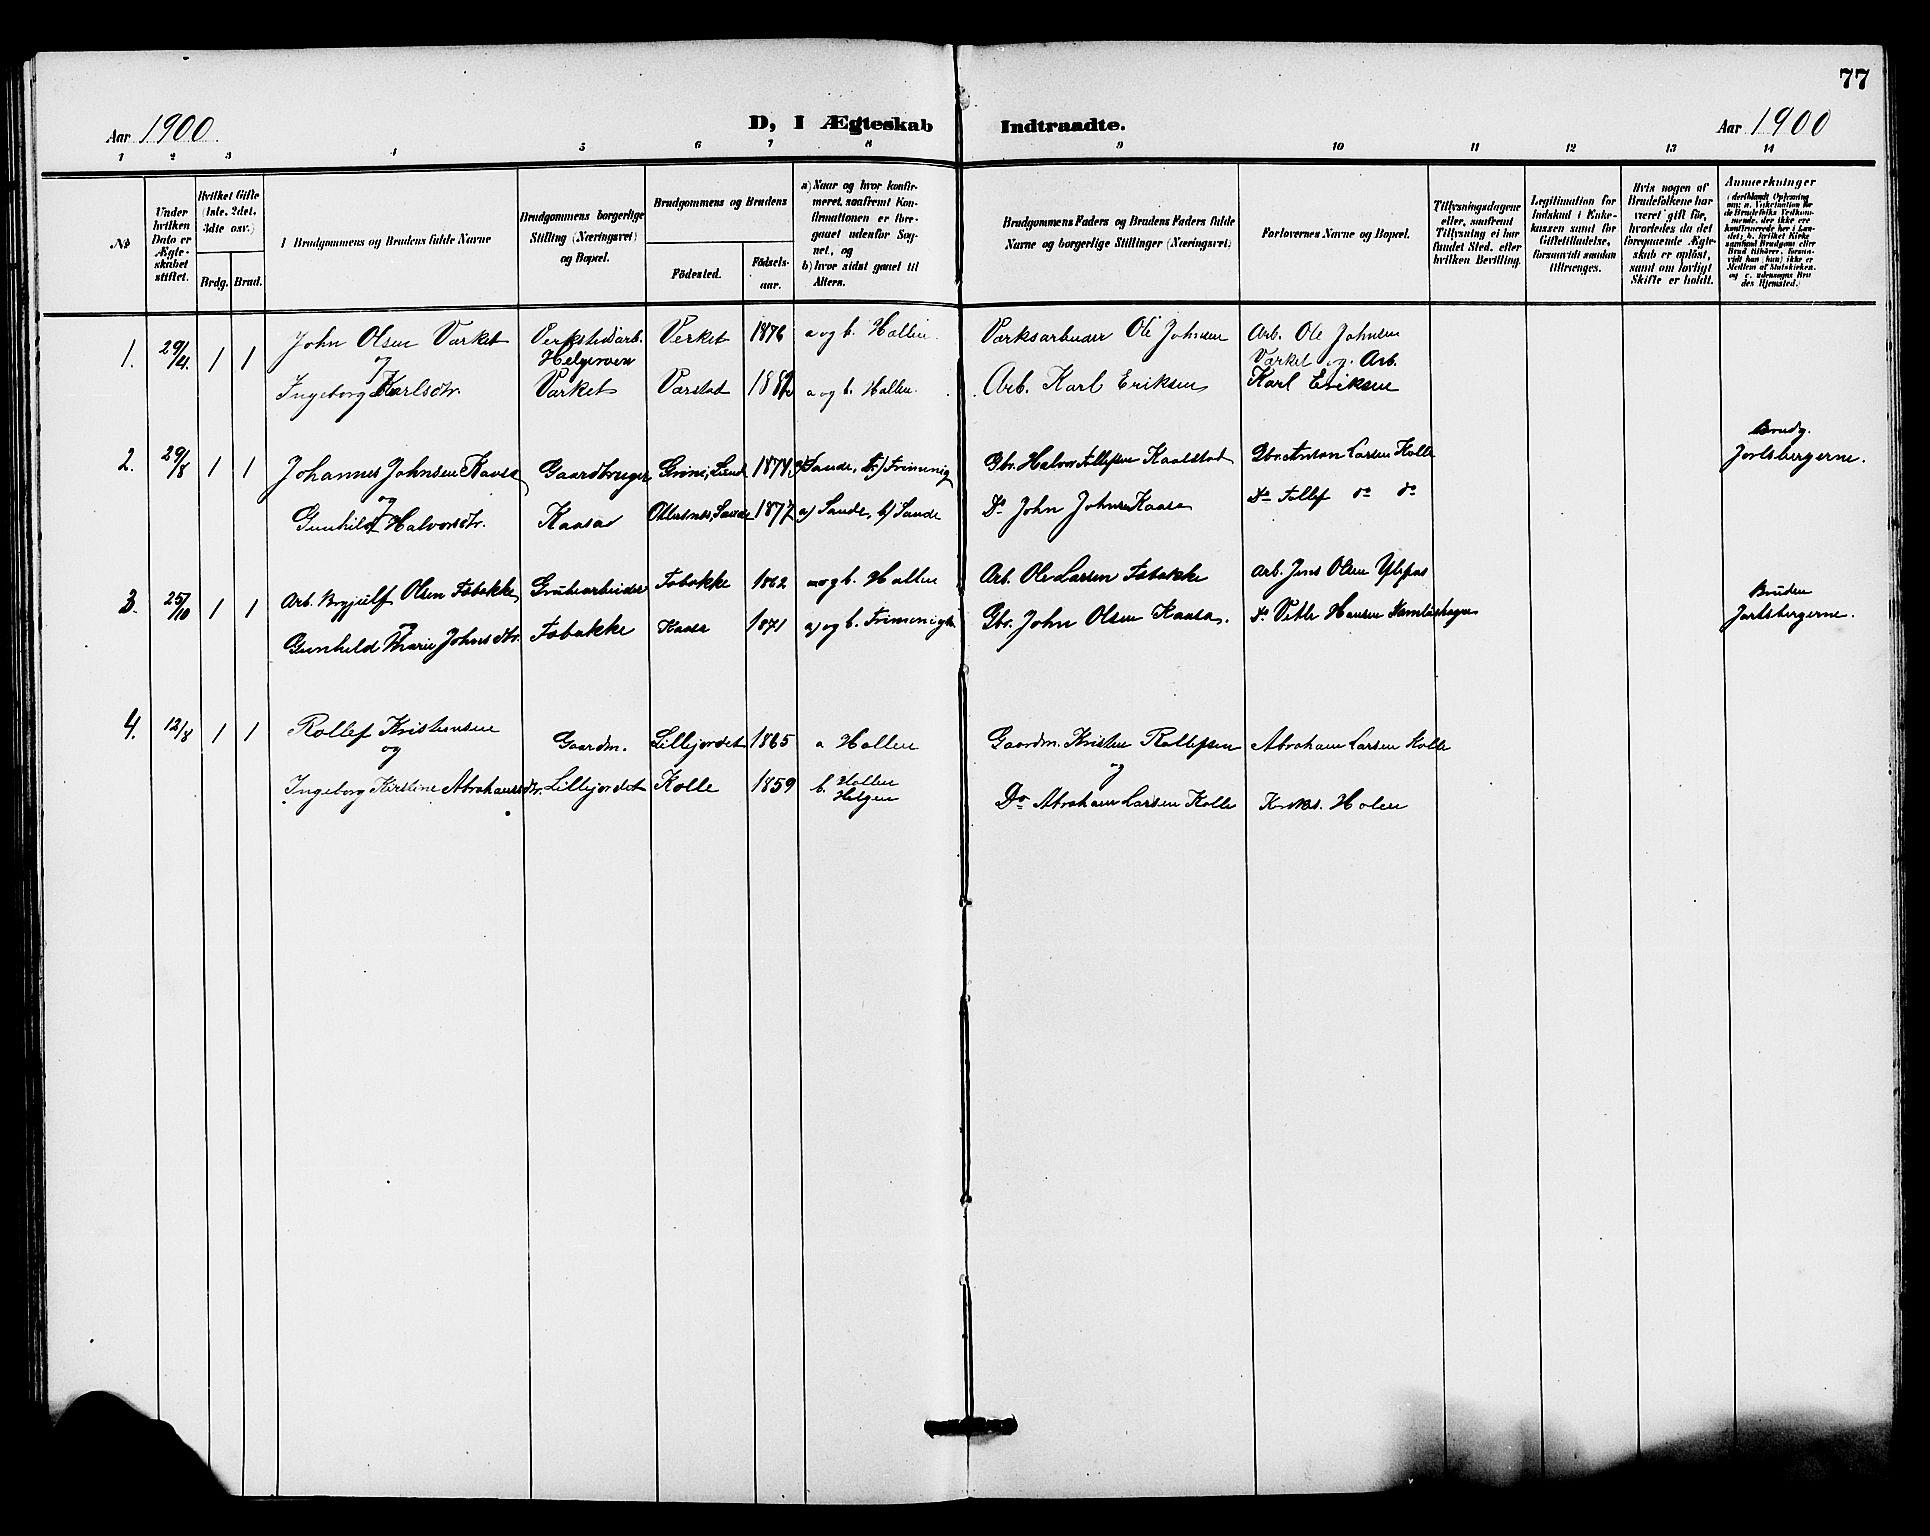 SAKO, Holla kirkebøker, G/Gb/L0002: Klokkerbok nr. II 2, 1897-1913, s. 77